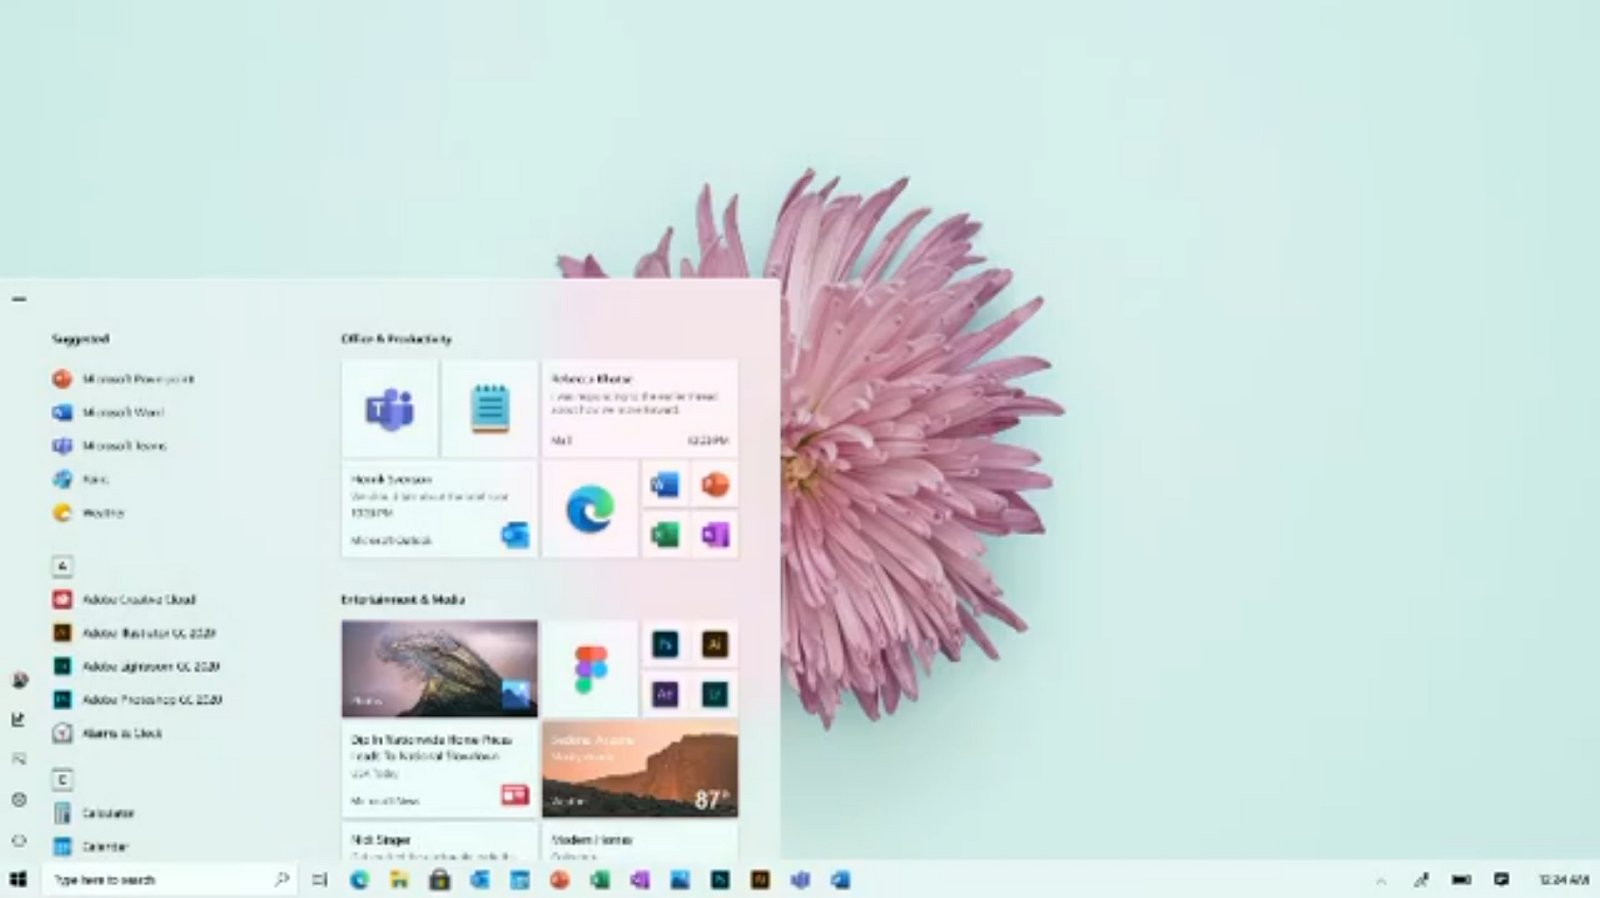 Windows 10 new Start menu with icons (source: Microsoft)